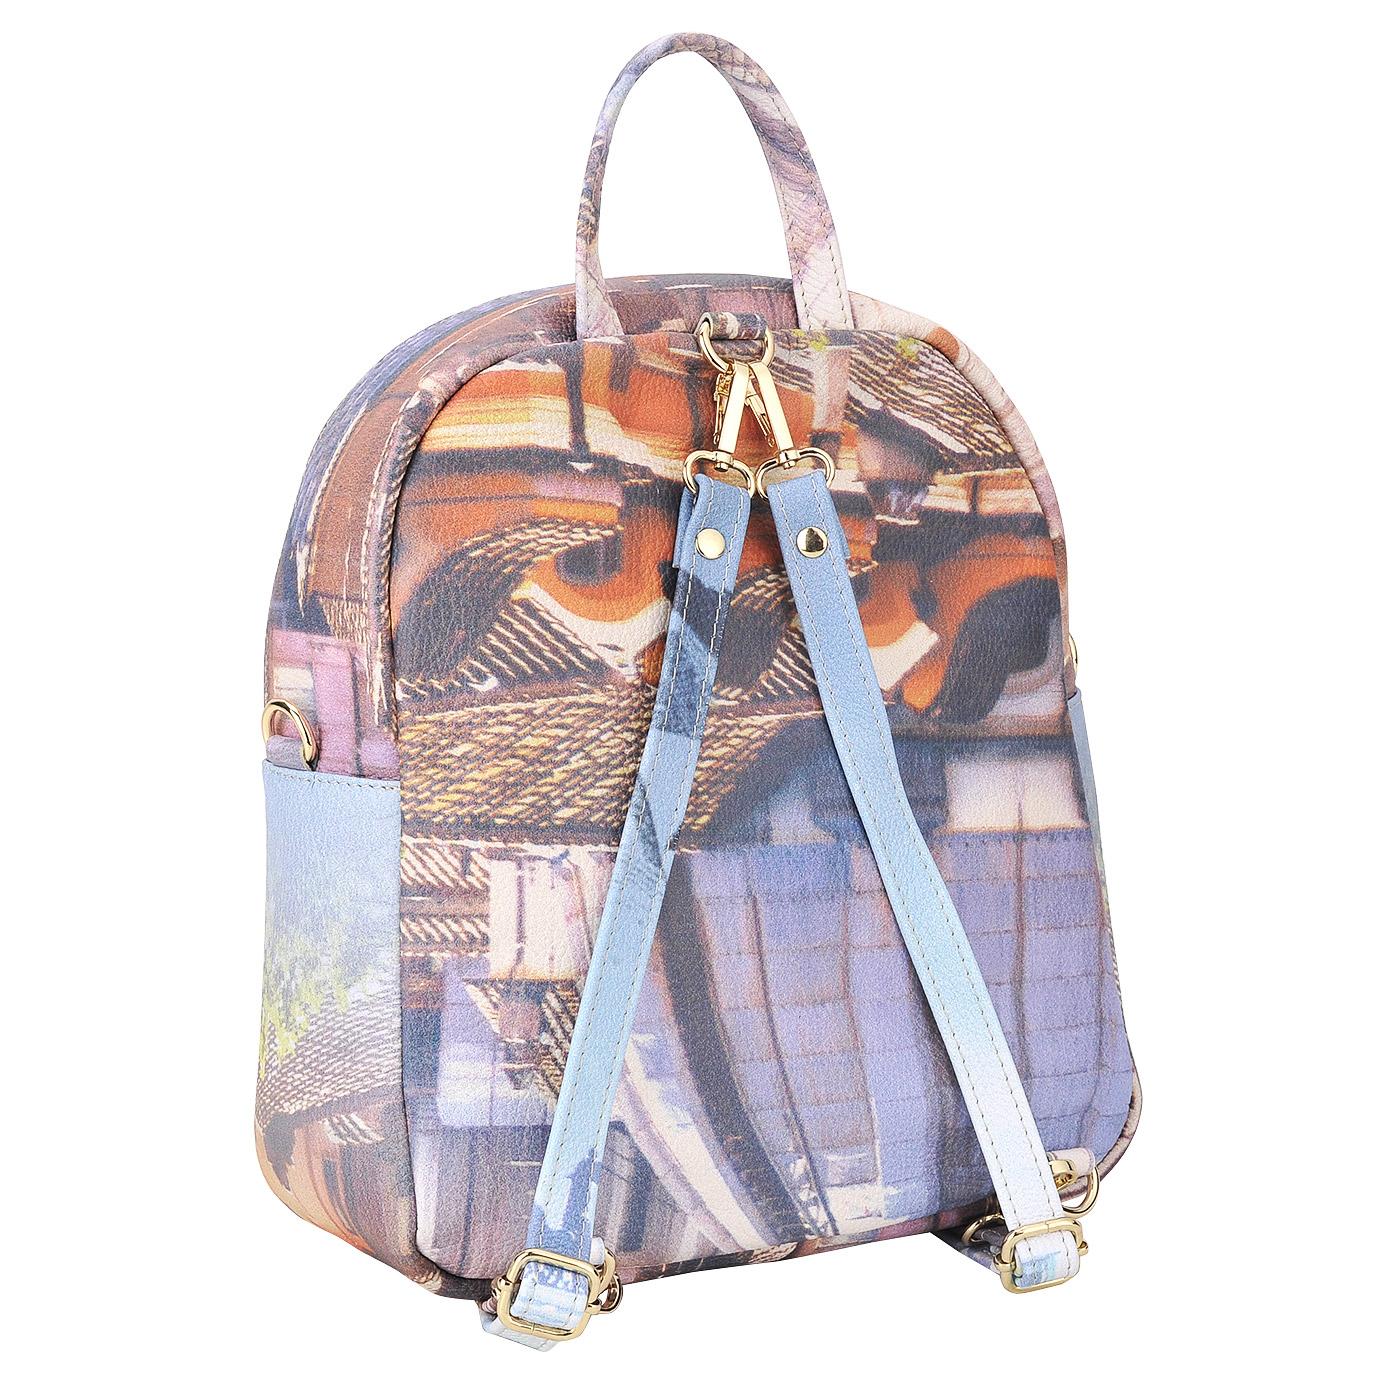 24803d90f922 Женский кожаный рюкзак Acquanegra Rome 705 M146B - 2000557580589 ...